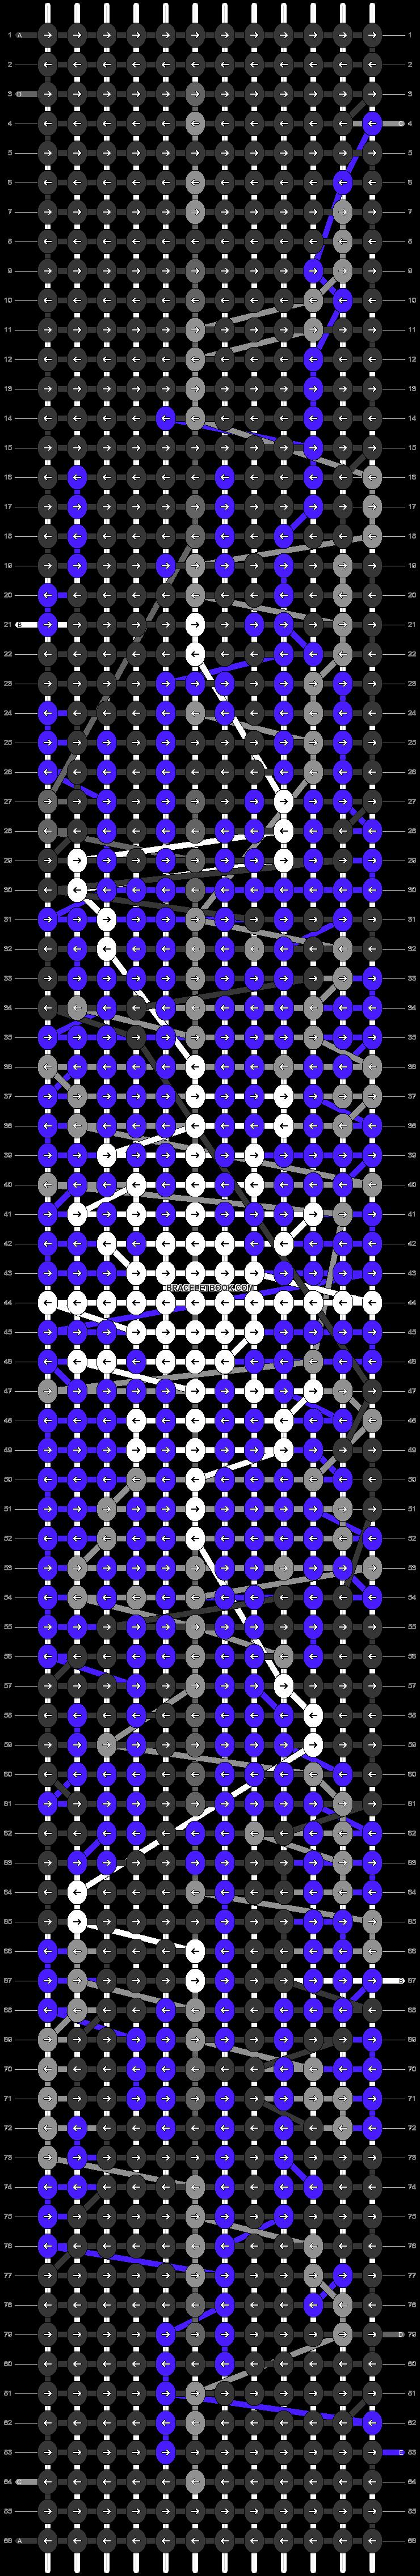 Alpha pattern #53199 pattern